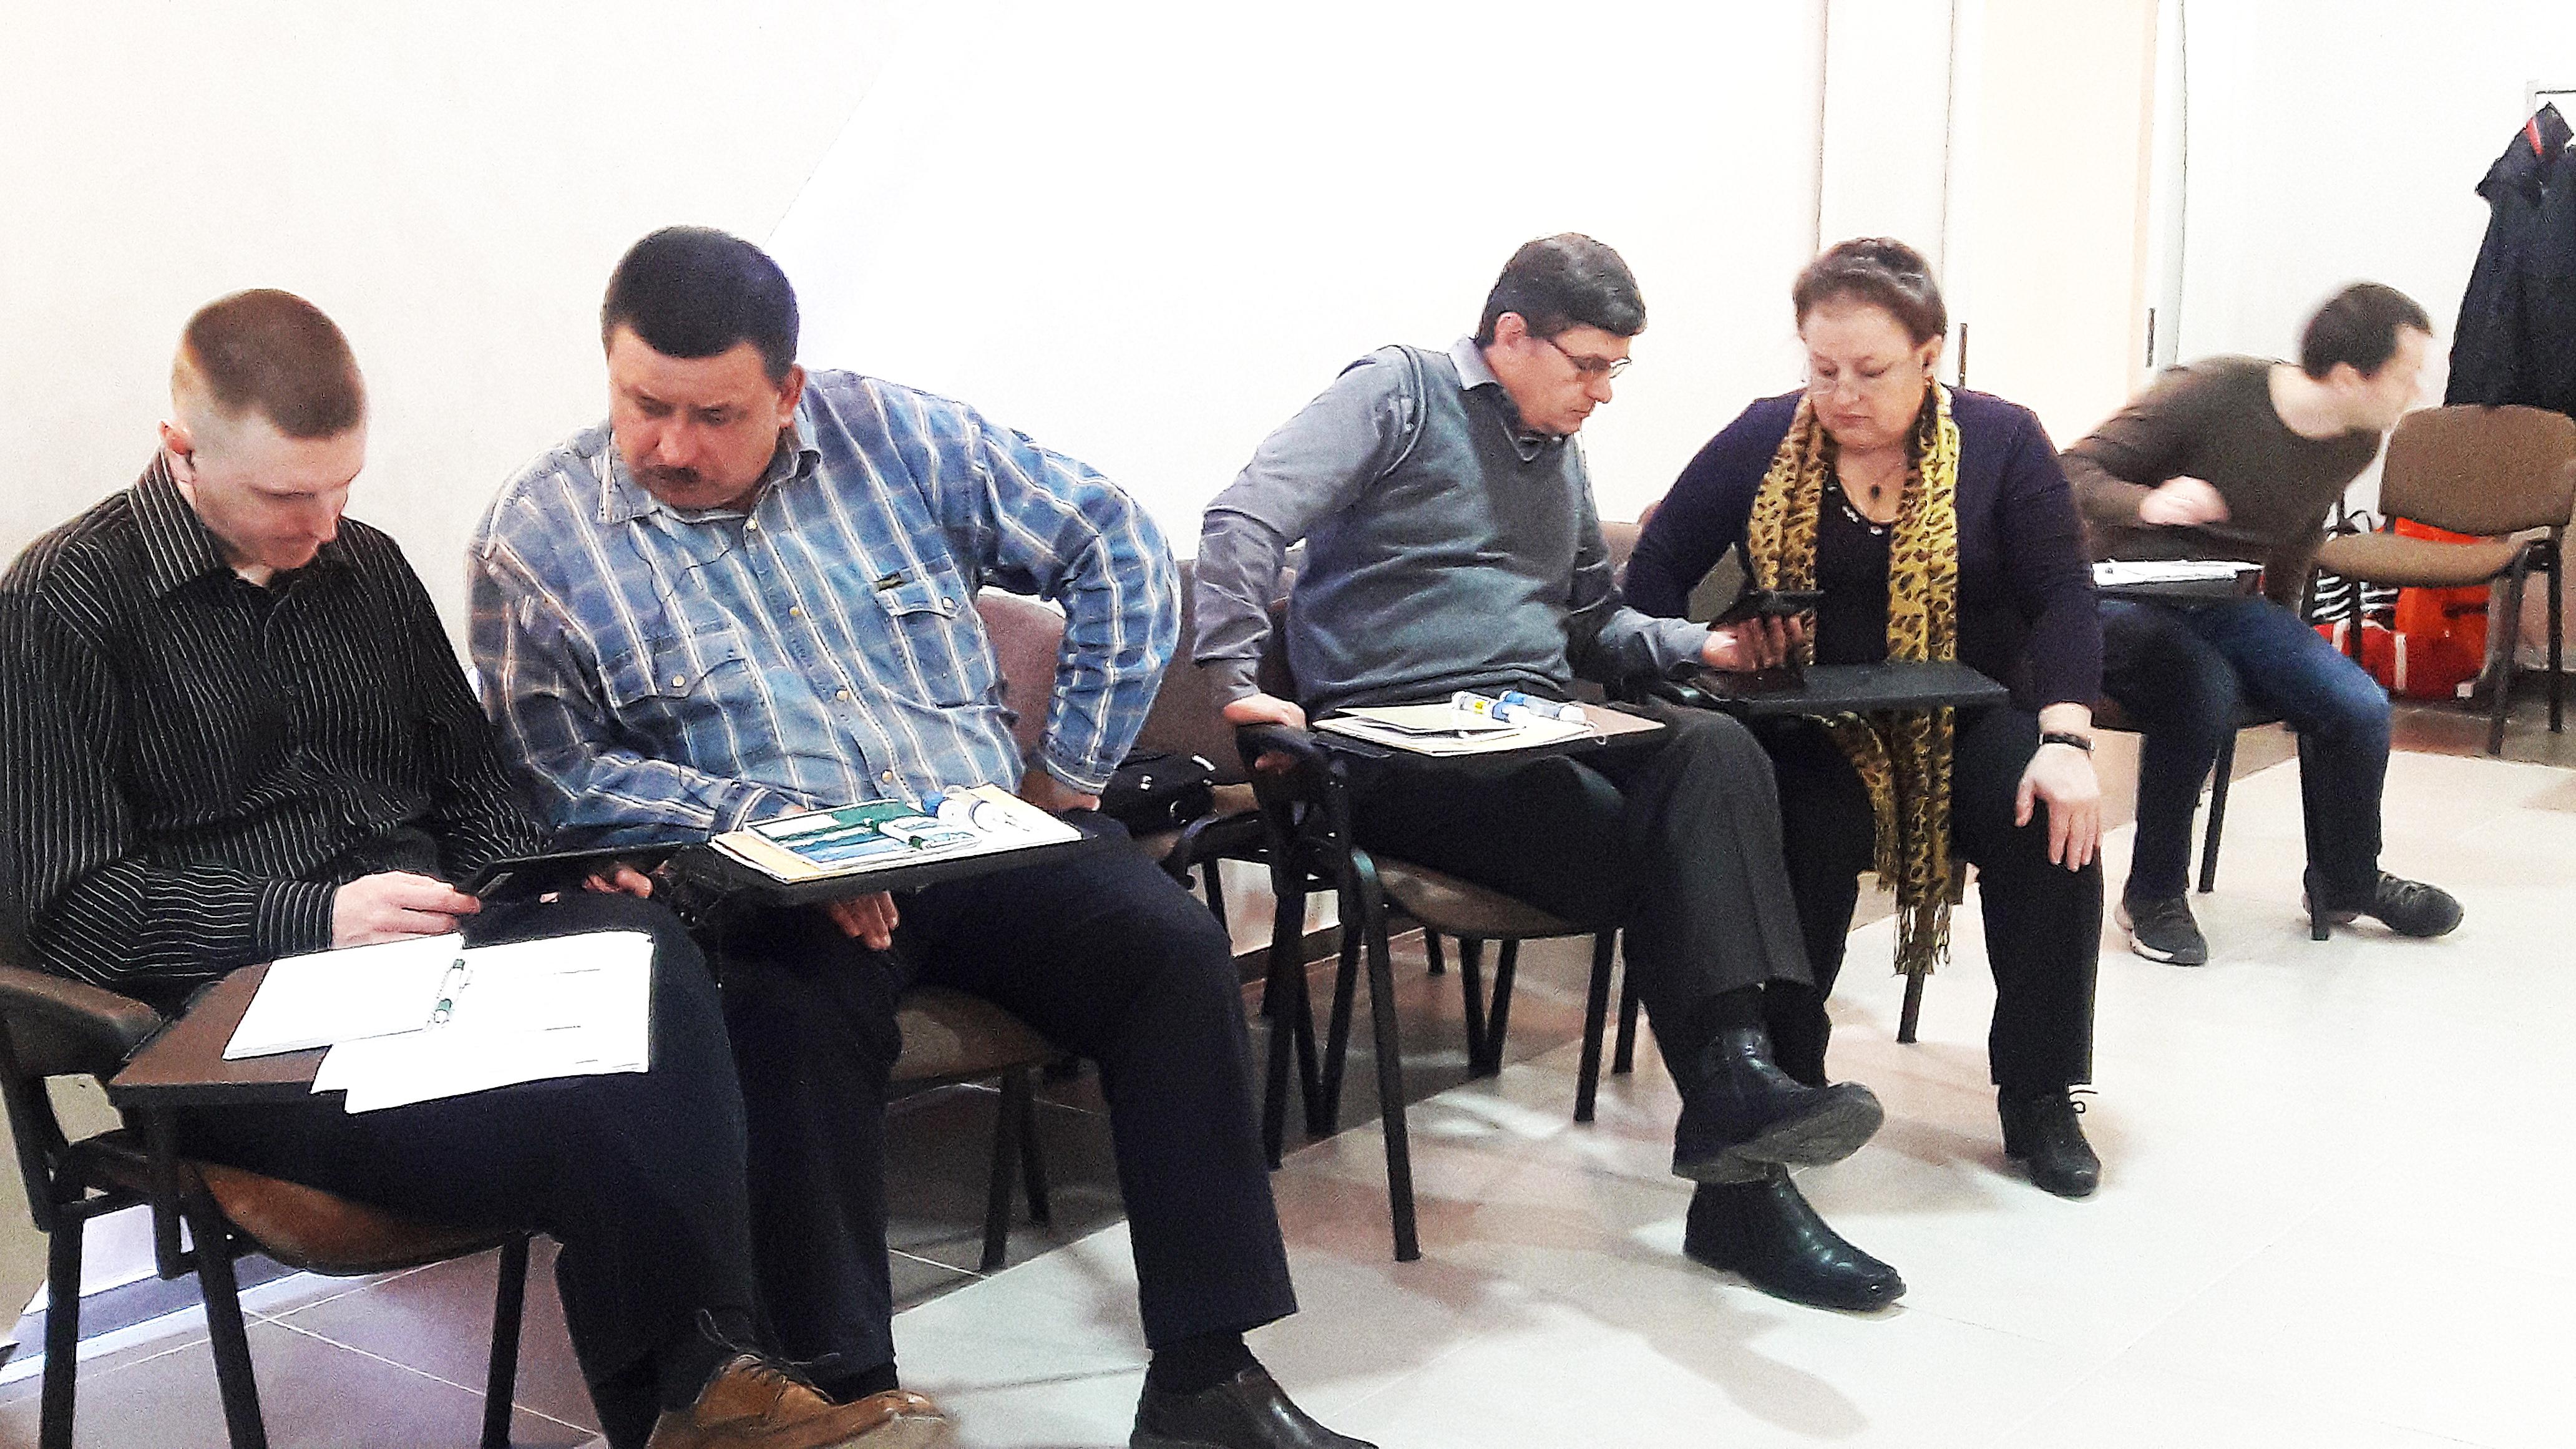 IWitness Seminar in Vinnitsa, Ukraine April 2017